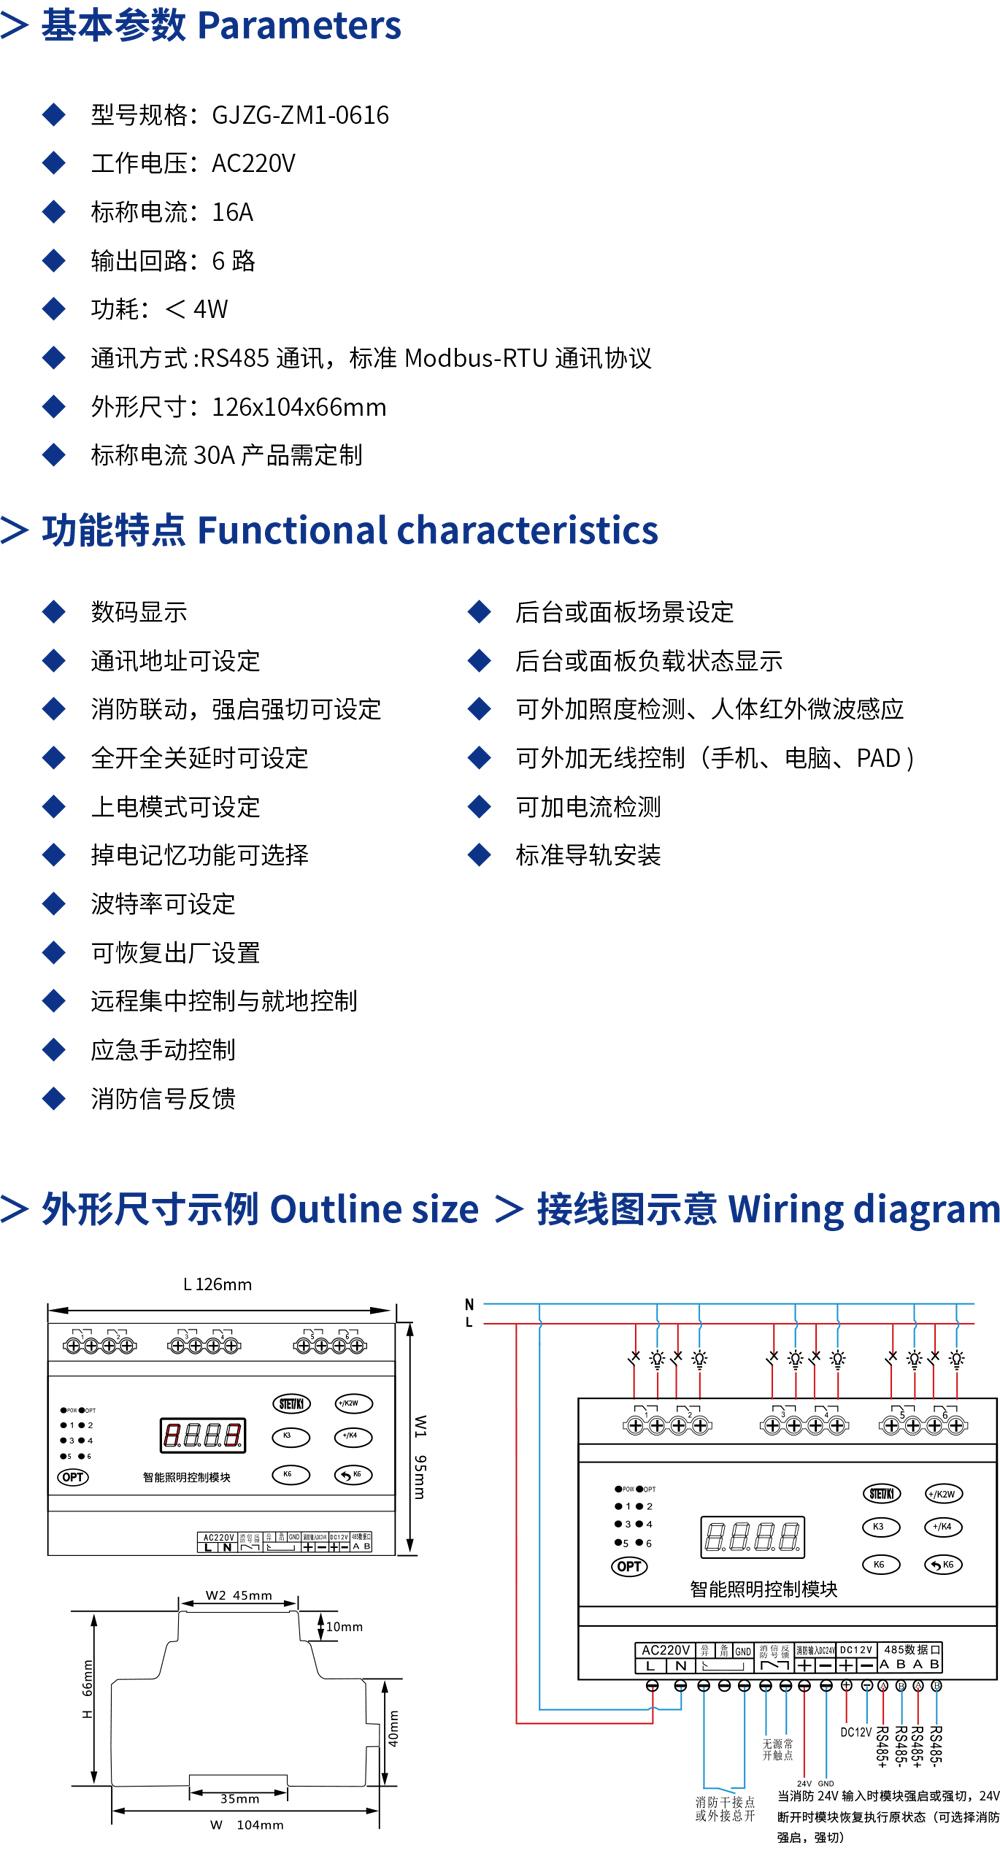 GJZG-ZM1-0616-6路智能照明控制模塊詳情.jpg